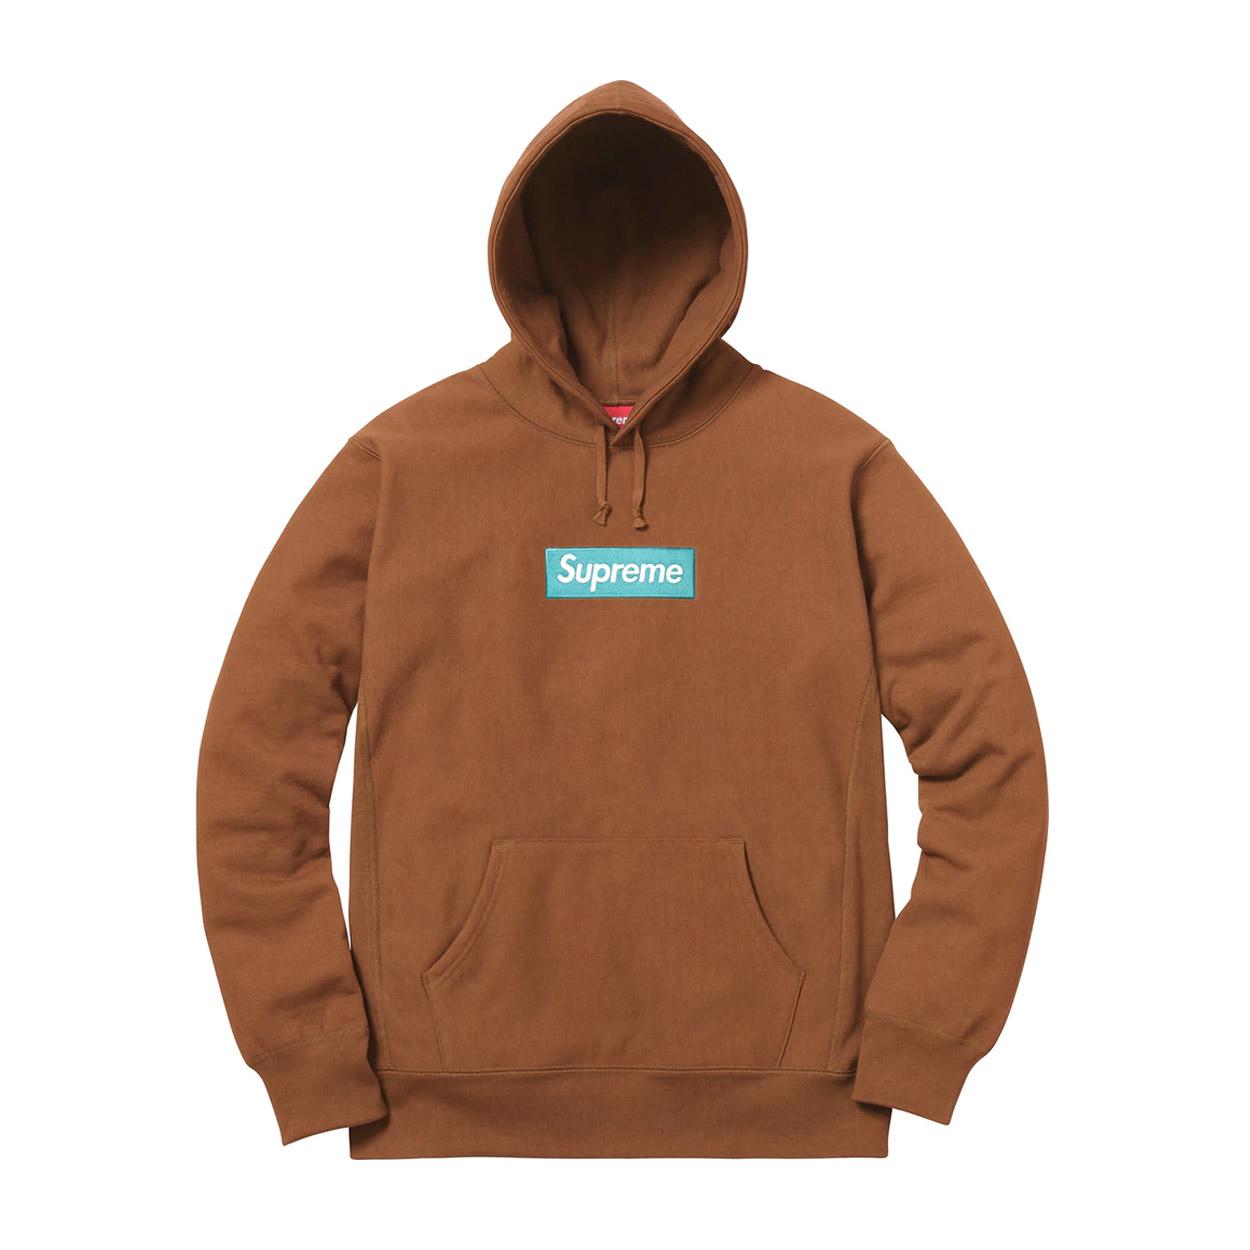 Supreme Box Logo Hooded Sweatshirt Fw17 Rust Novelship And Sneakers Streetwear 100 Authentic